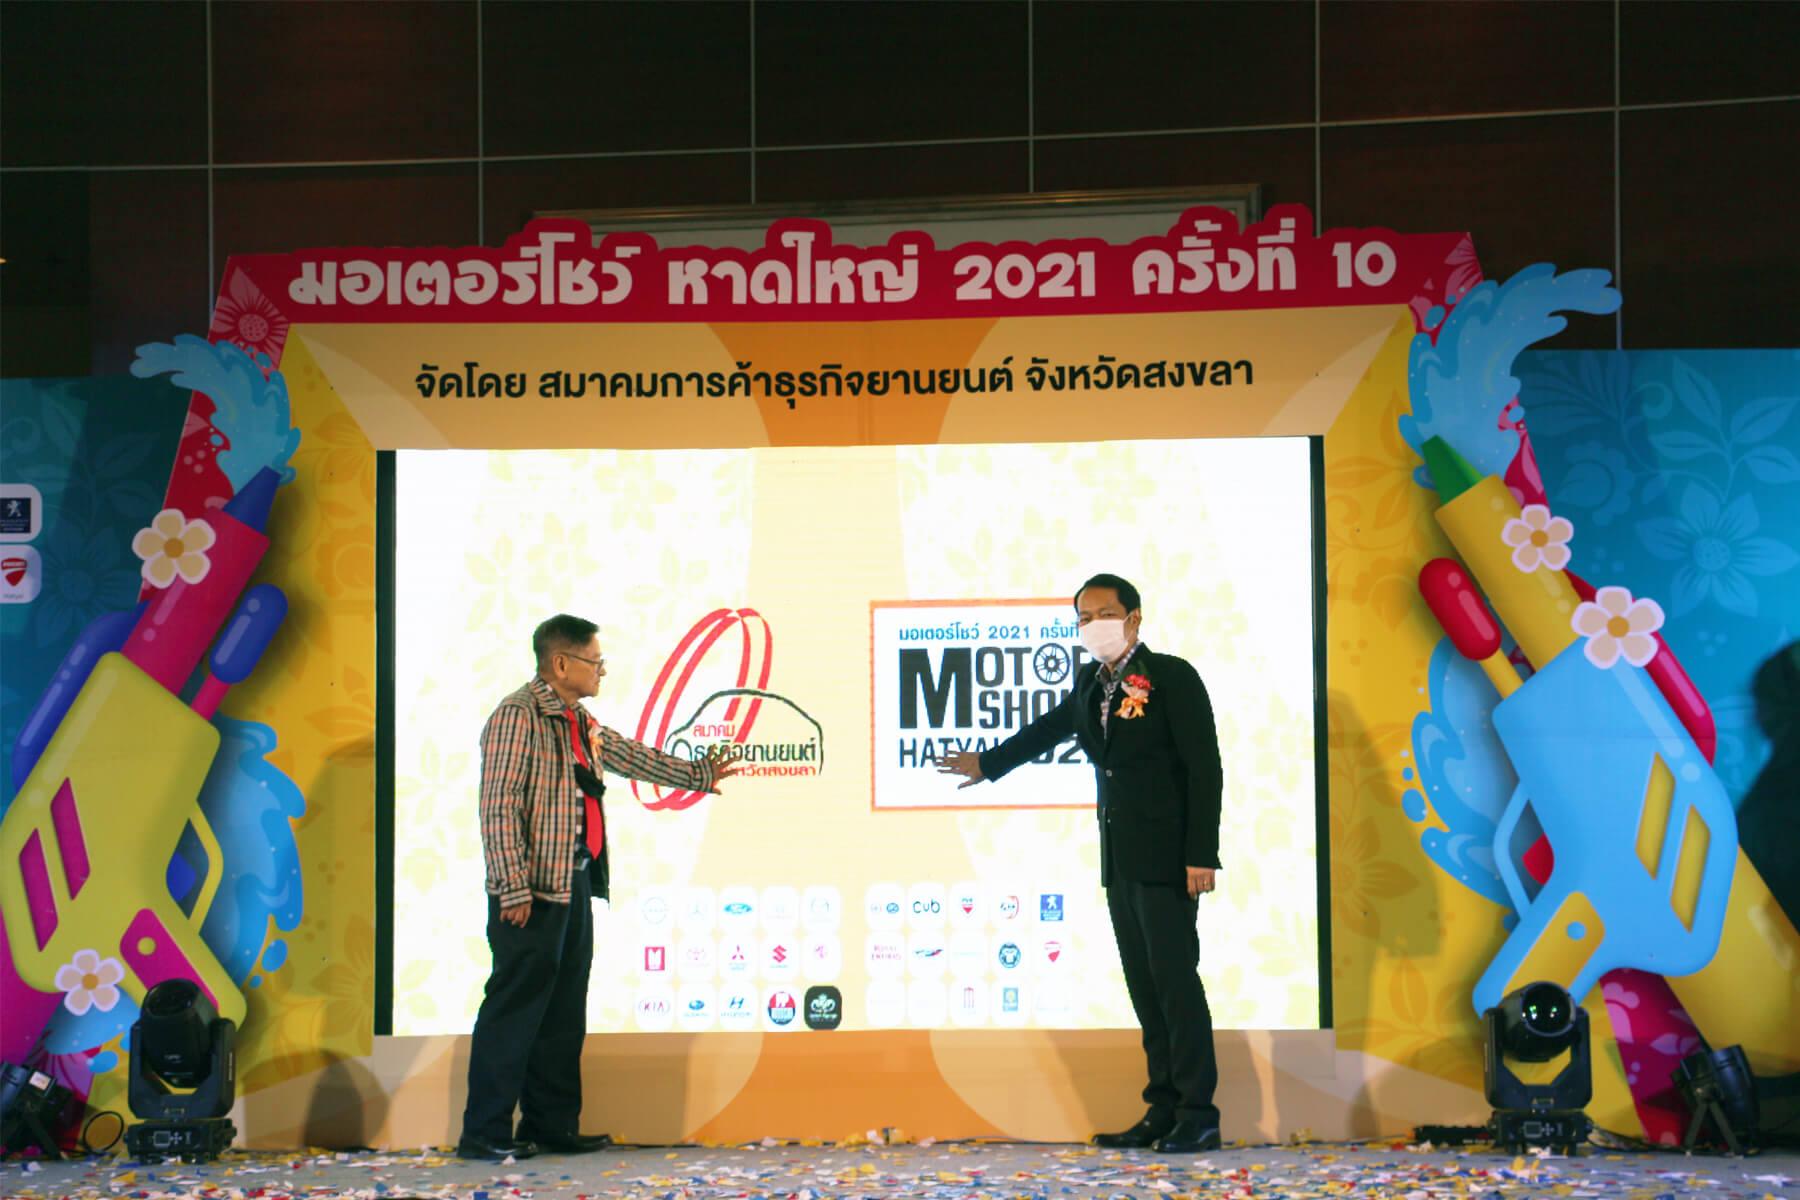 ICC Hat Yai Update พิธีเปิด Motor Show 2021 ICC HATYAI ศูนย์ประชุมนานาชาติฉลองสิริราชสมบัติครบ ๖๐ ปี